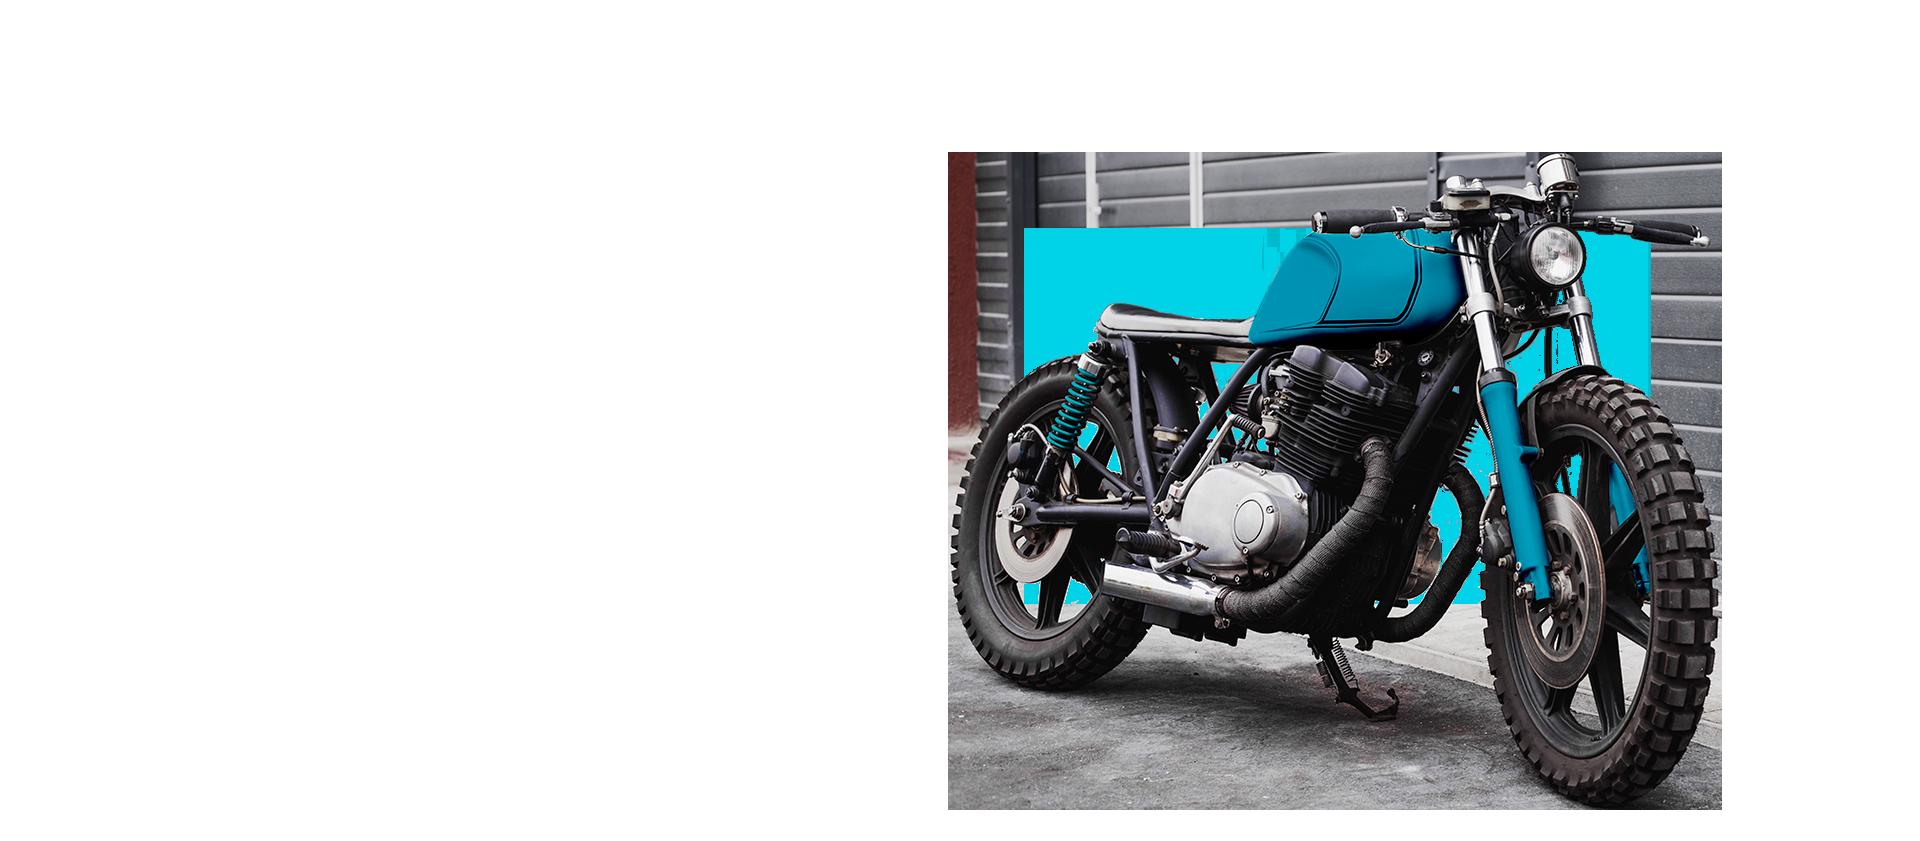 Slide 3 Motorbike Blue 4